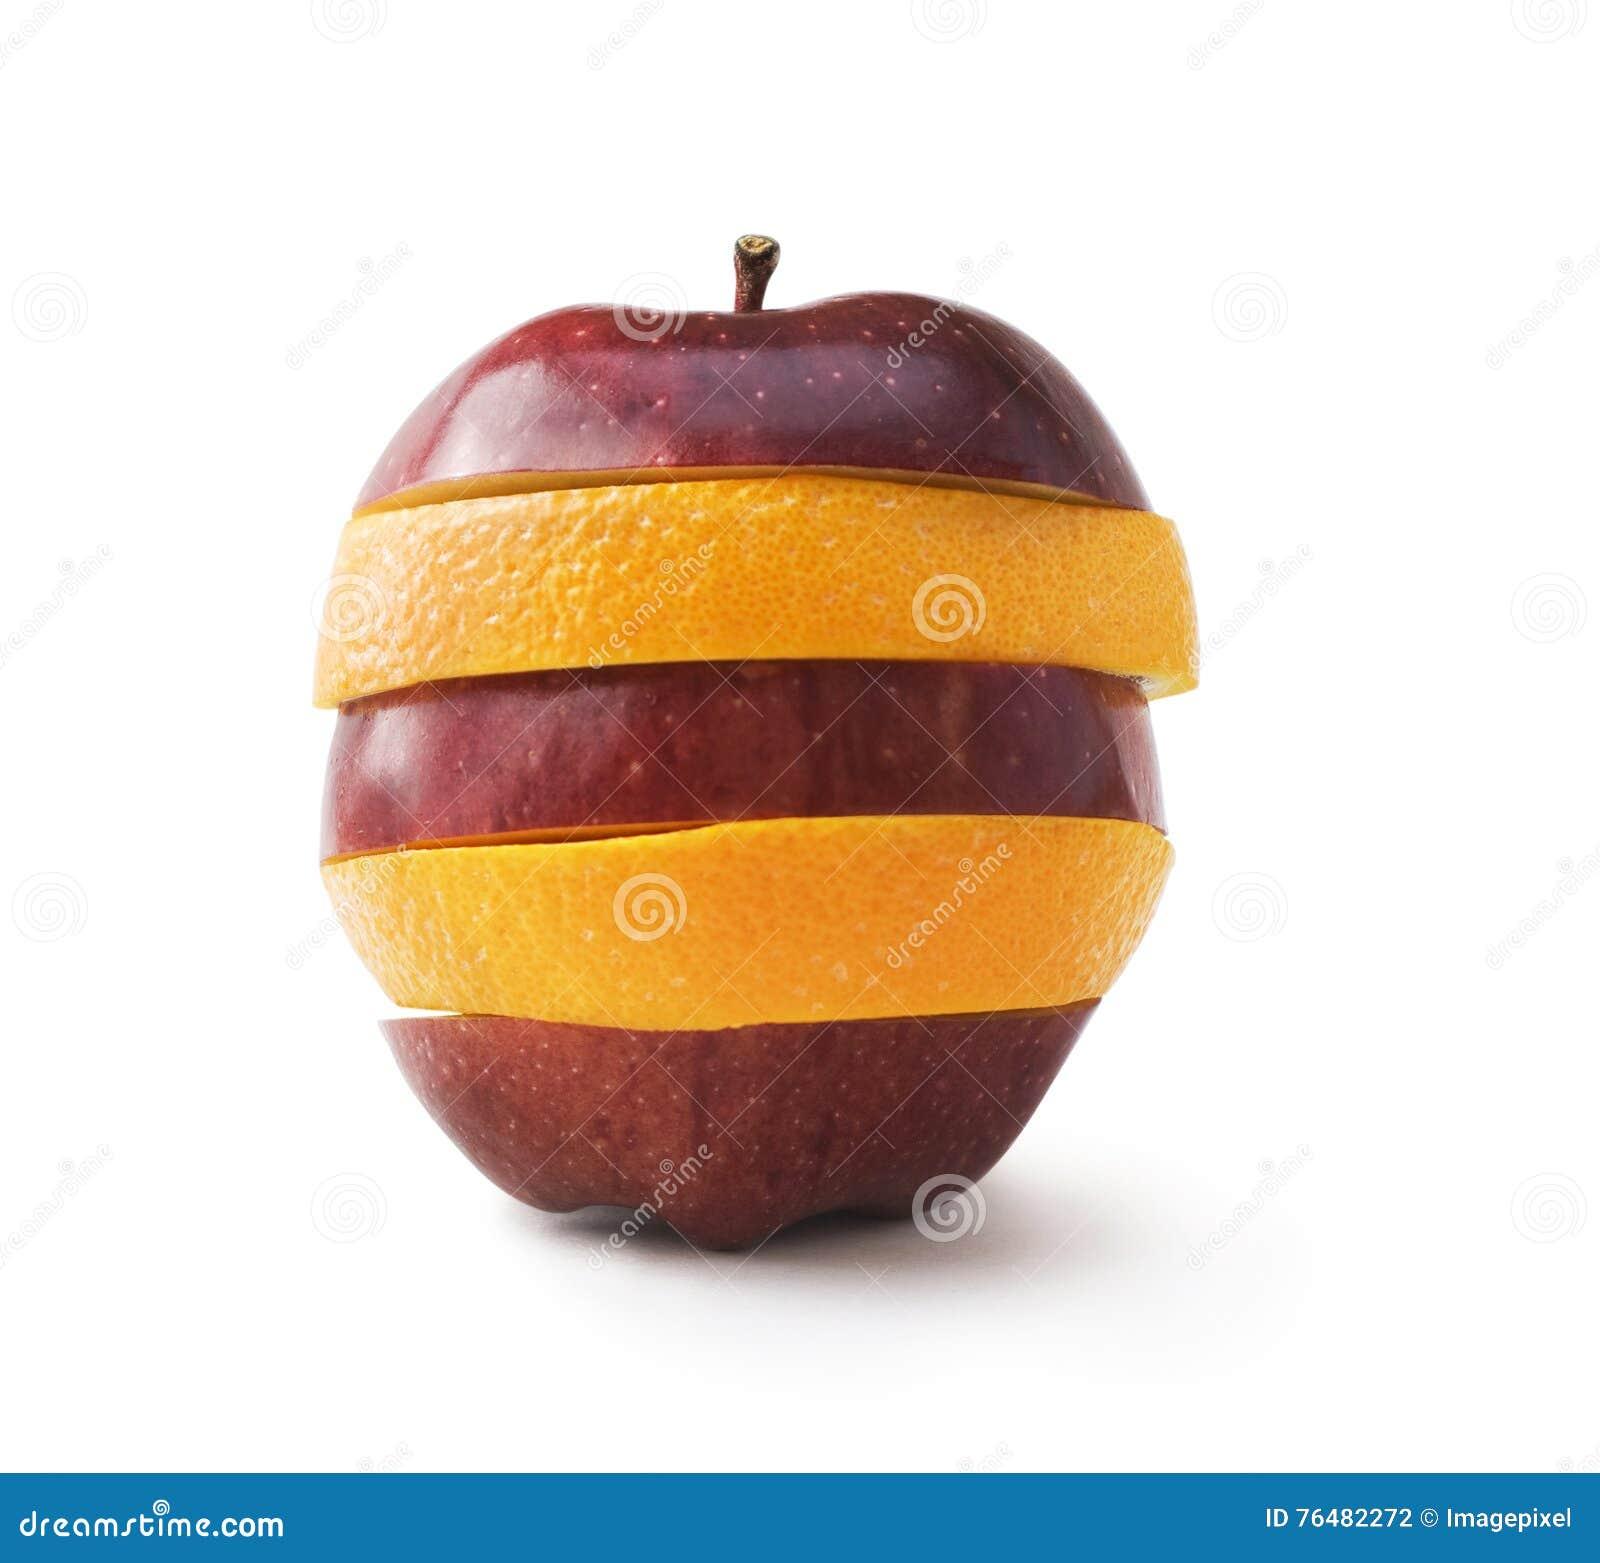 AppleOrangeSlice